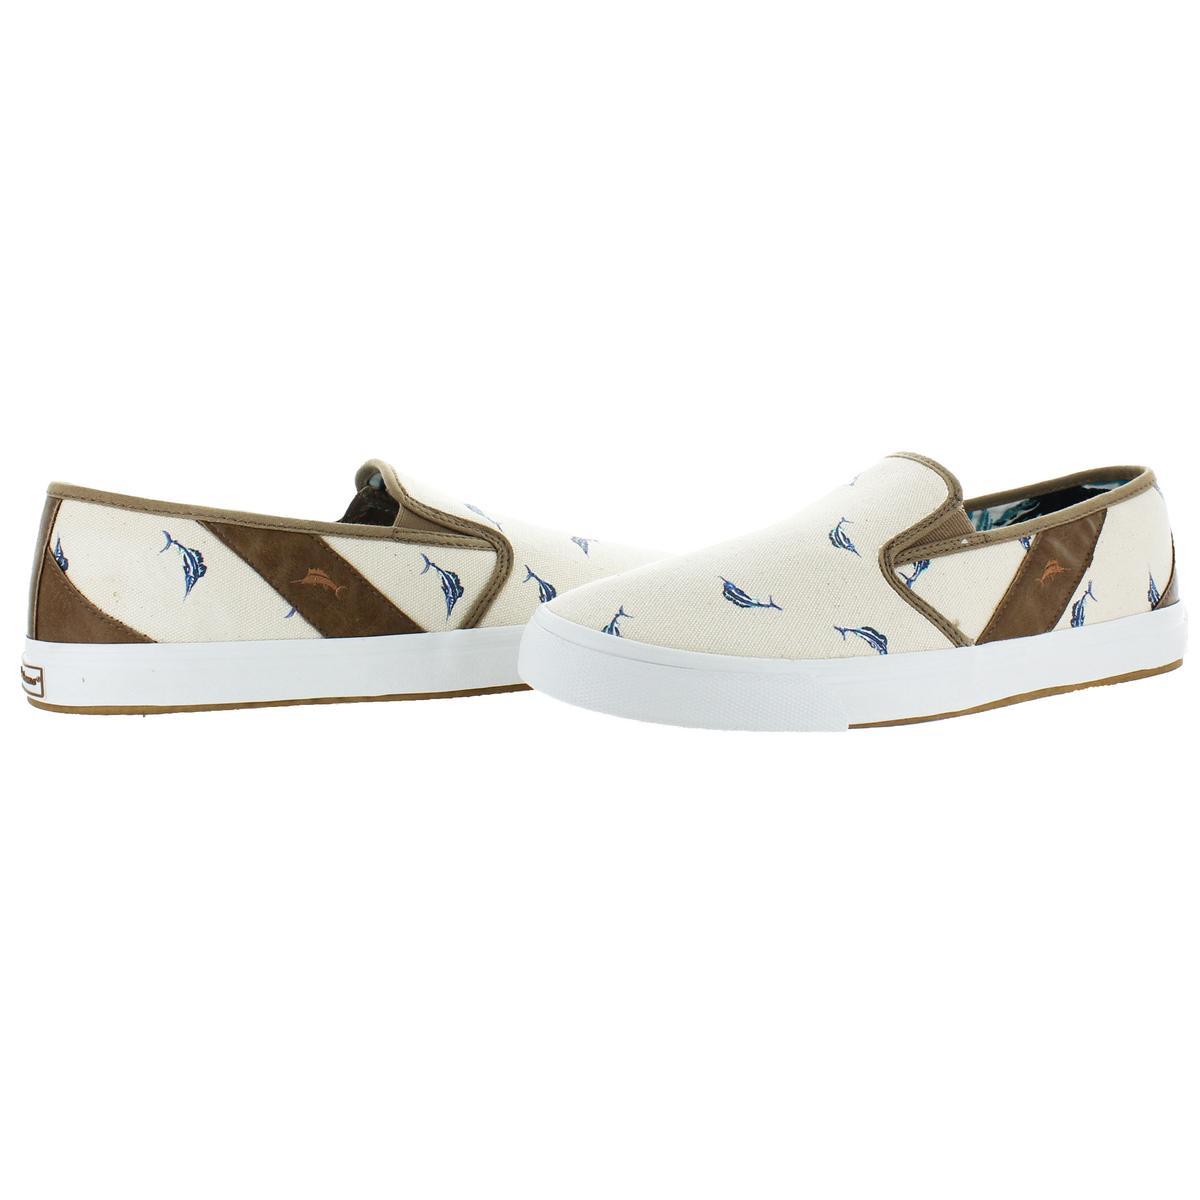 Tommy Bahama Uomo Pacific Ridge Flats Scarpe Flexible Loafers Scarpe Flats BHFO 5449 ac1a14